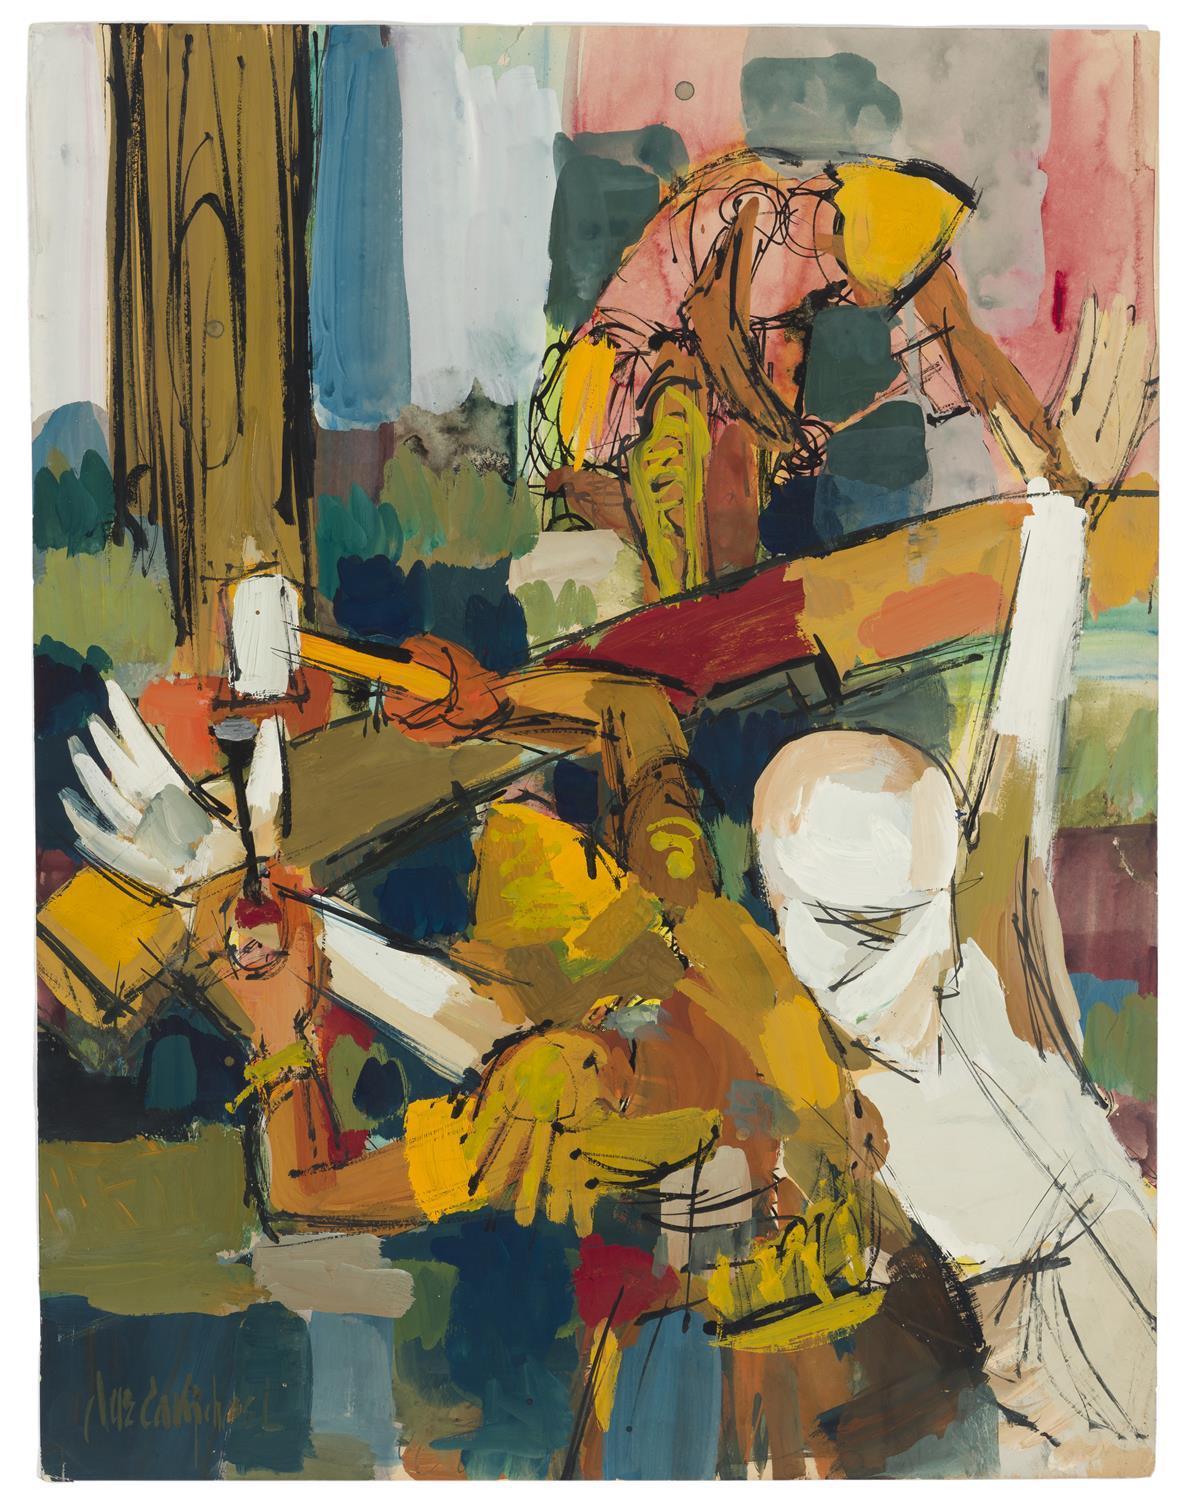 "Jae Carmichael, (1925-2005 Los Angeles, CA), Crucifixion, Watercolor and gouache on paper, Sheet: 22"" H x 17"" W"